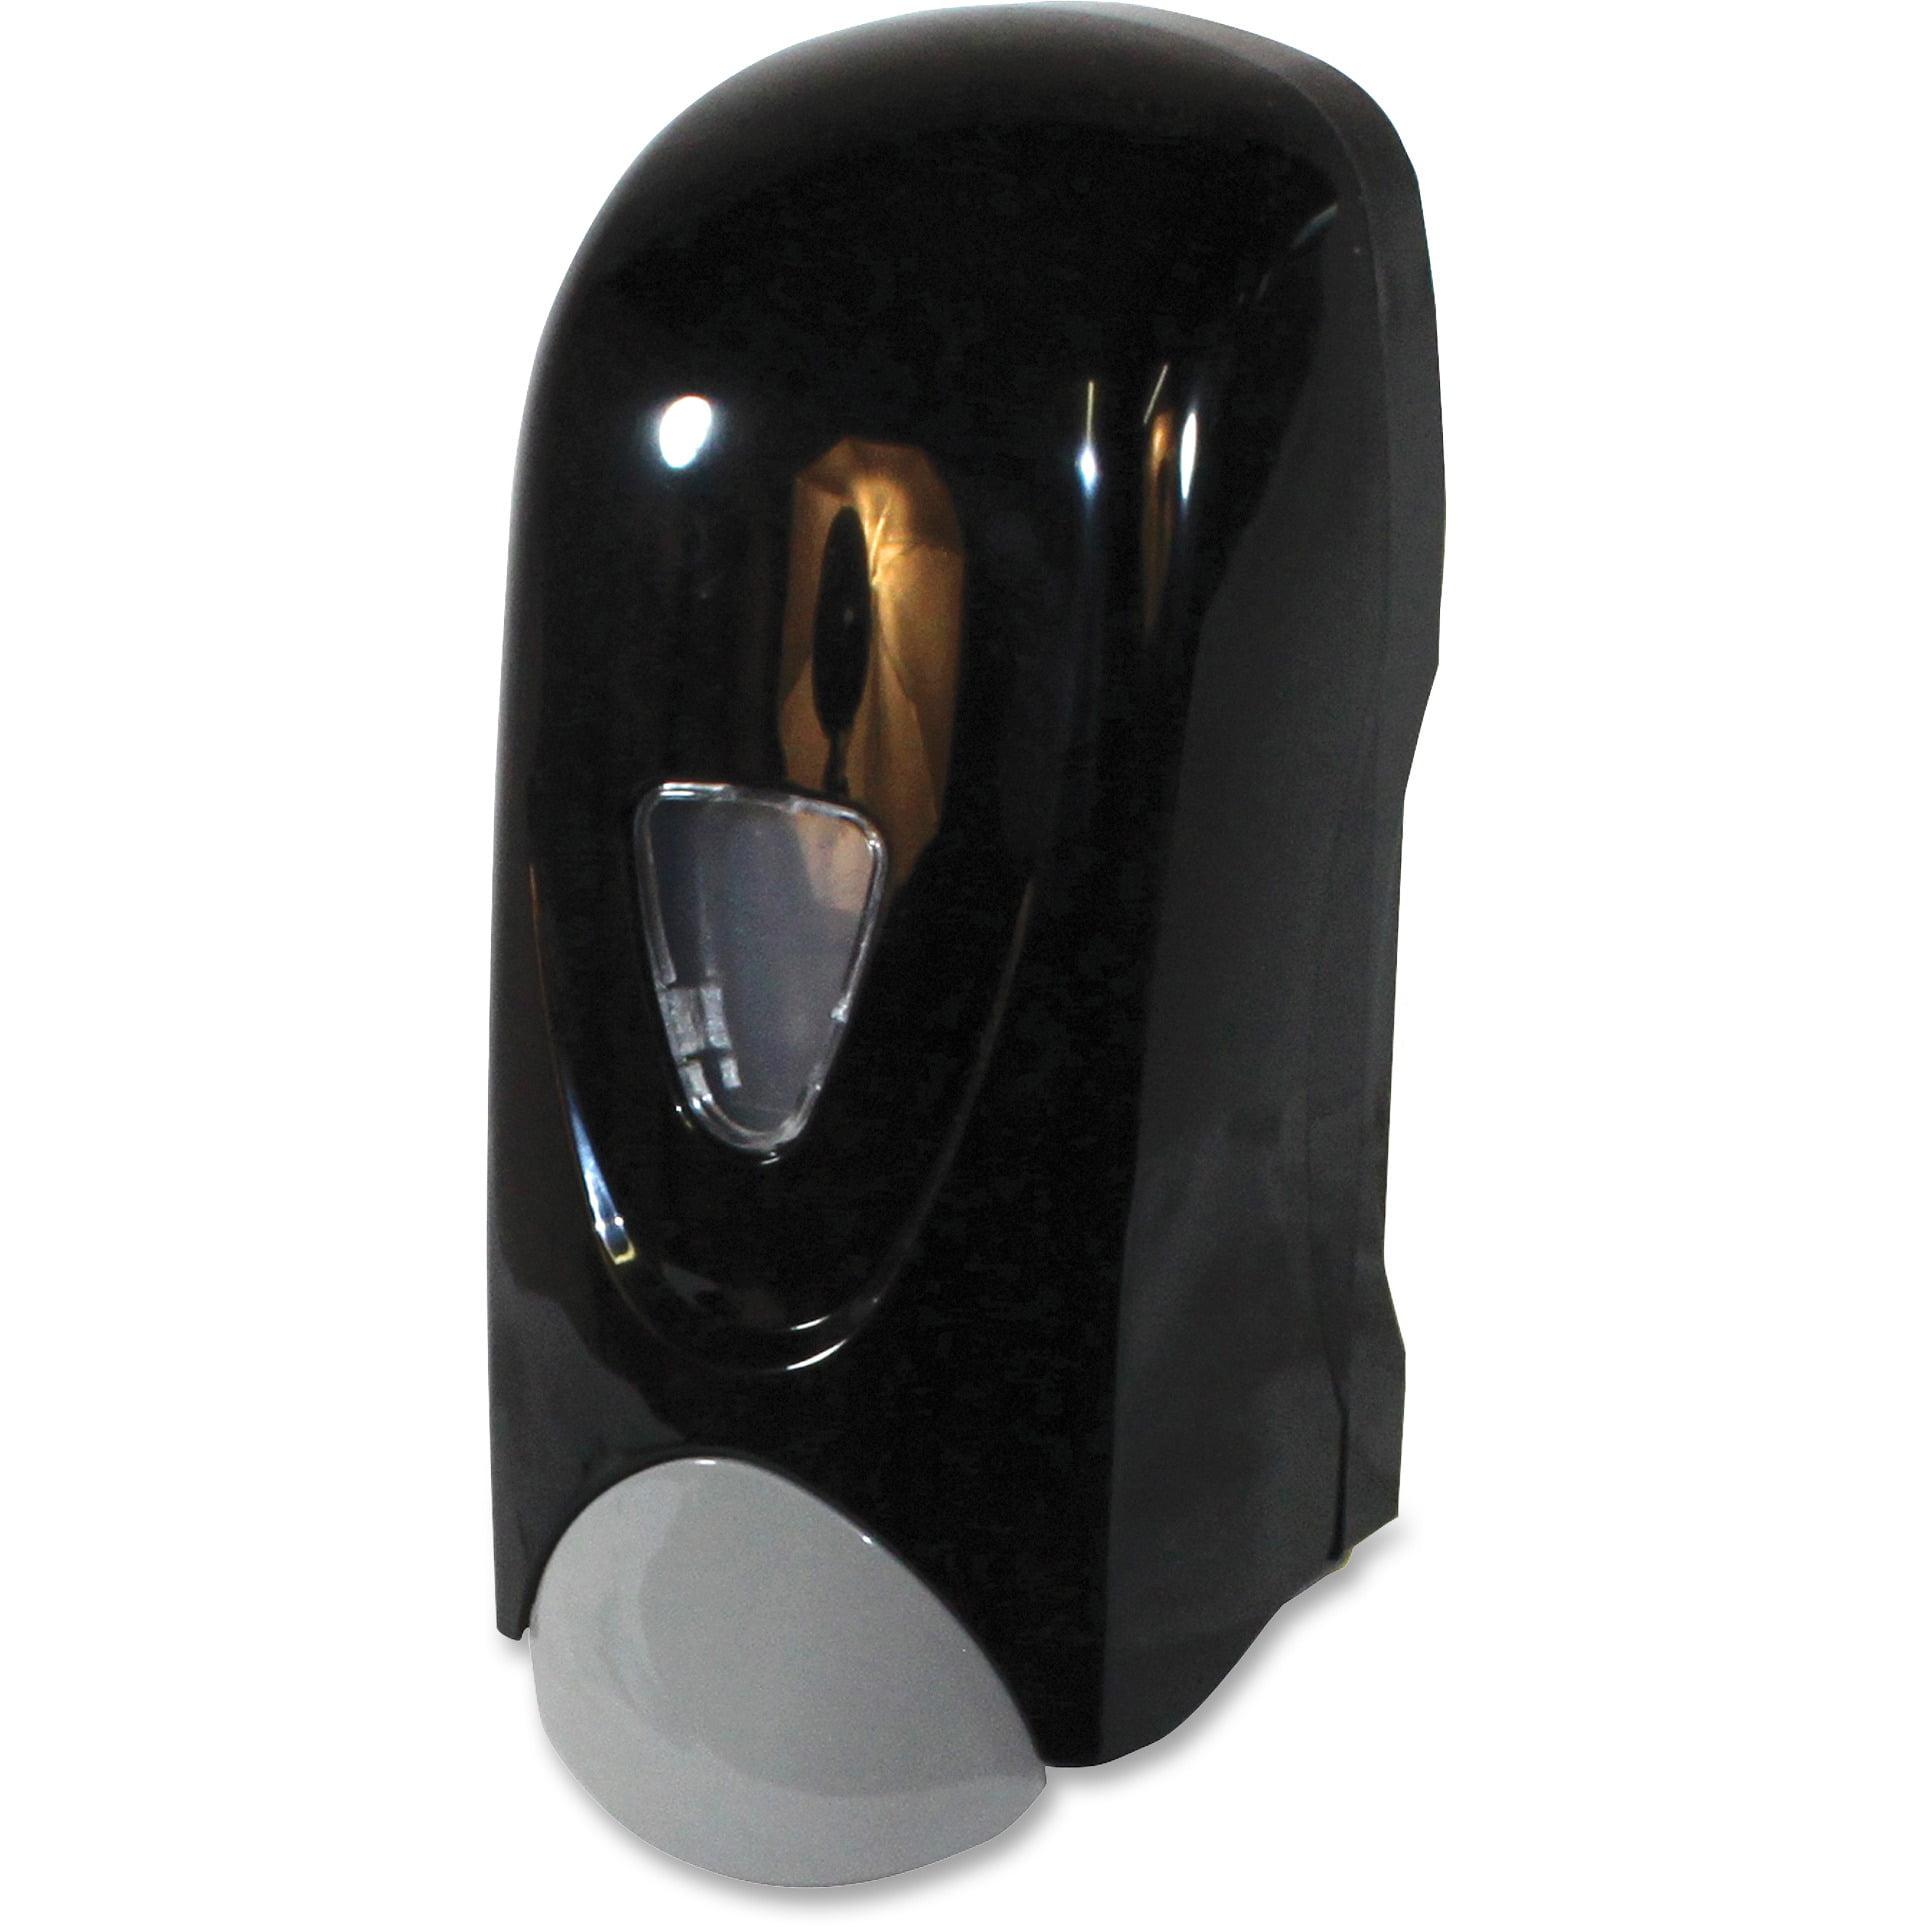 Genuine Joe 1000 ml Foam Soap Dispenser, 1.06 quart, GJO85138